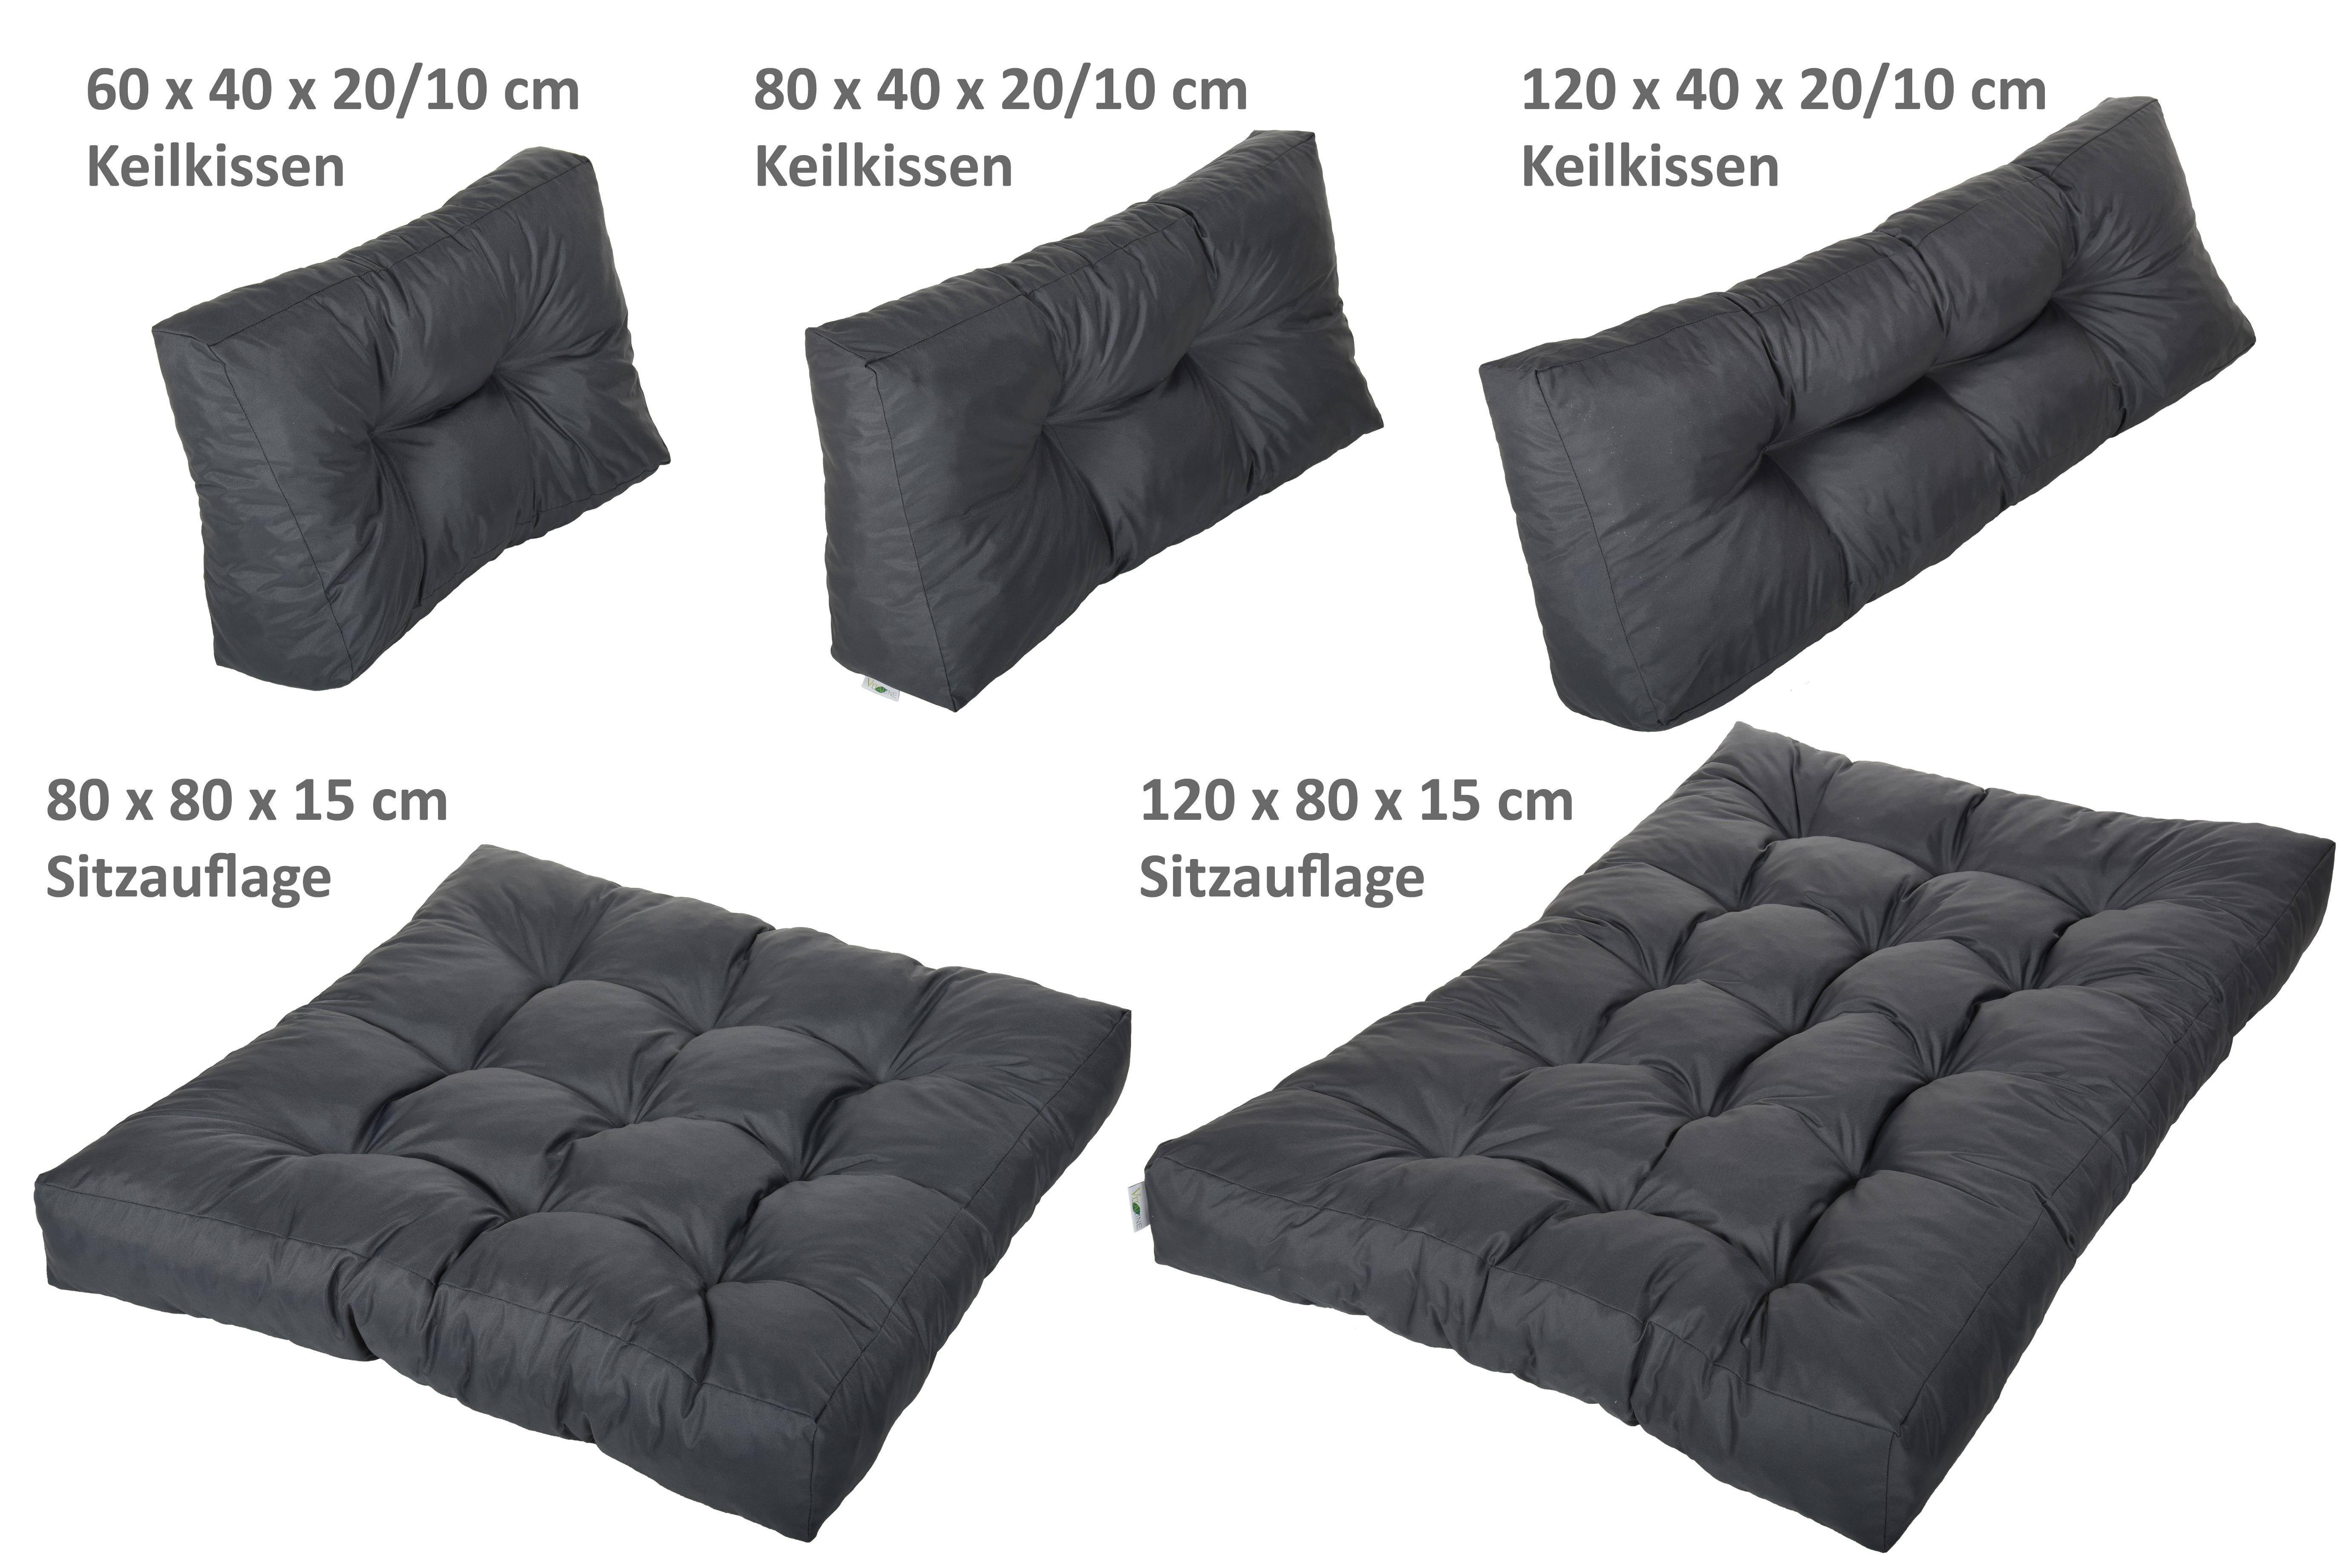 vita line palettenkissen palettensofa palettenpolster polster auflage kissen s ebay. Black Bedroom Furniture Sets. Home Design Ideas